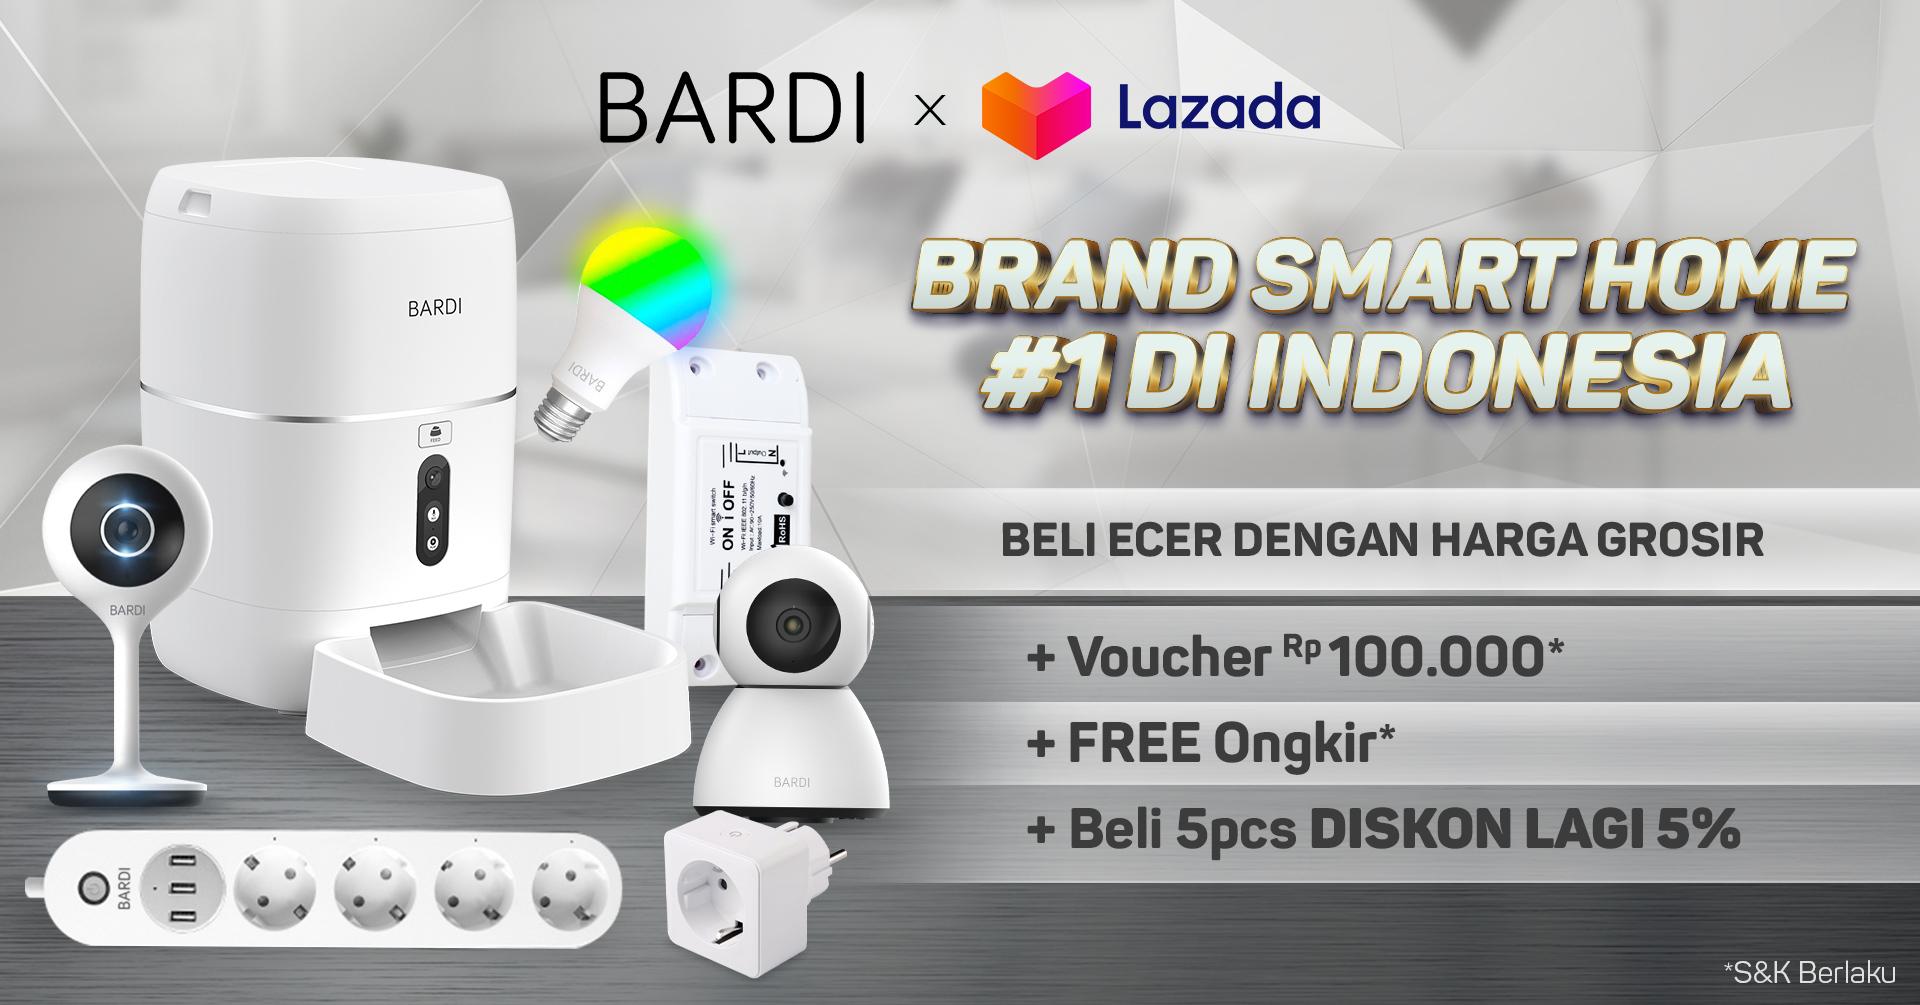 Lazada Bardi Smart Home